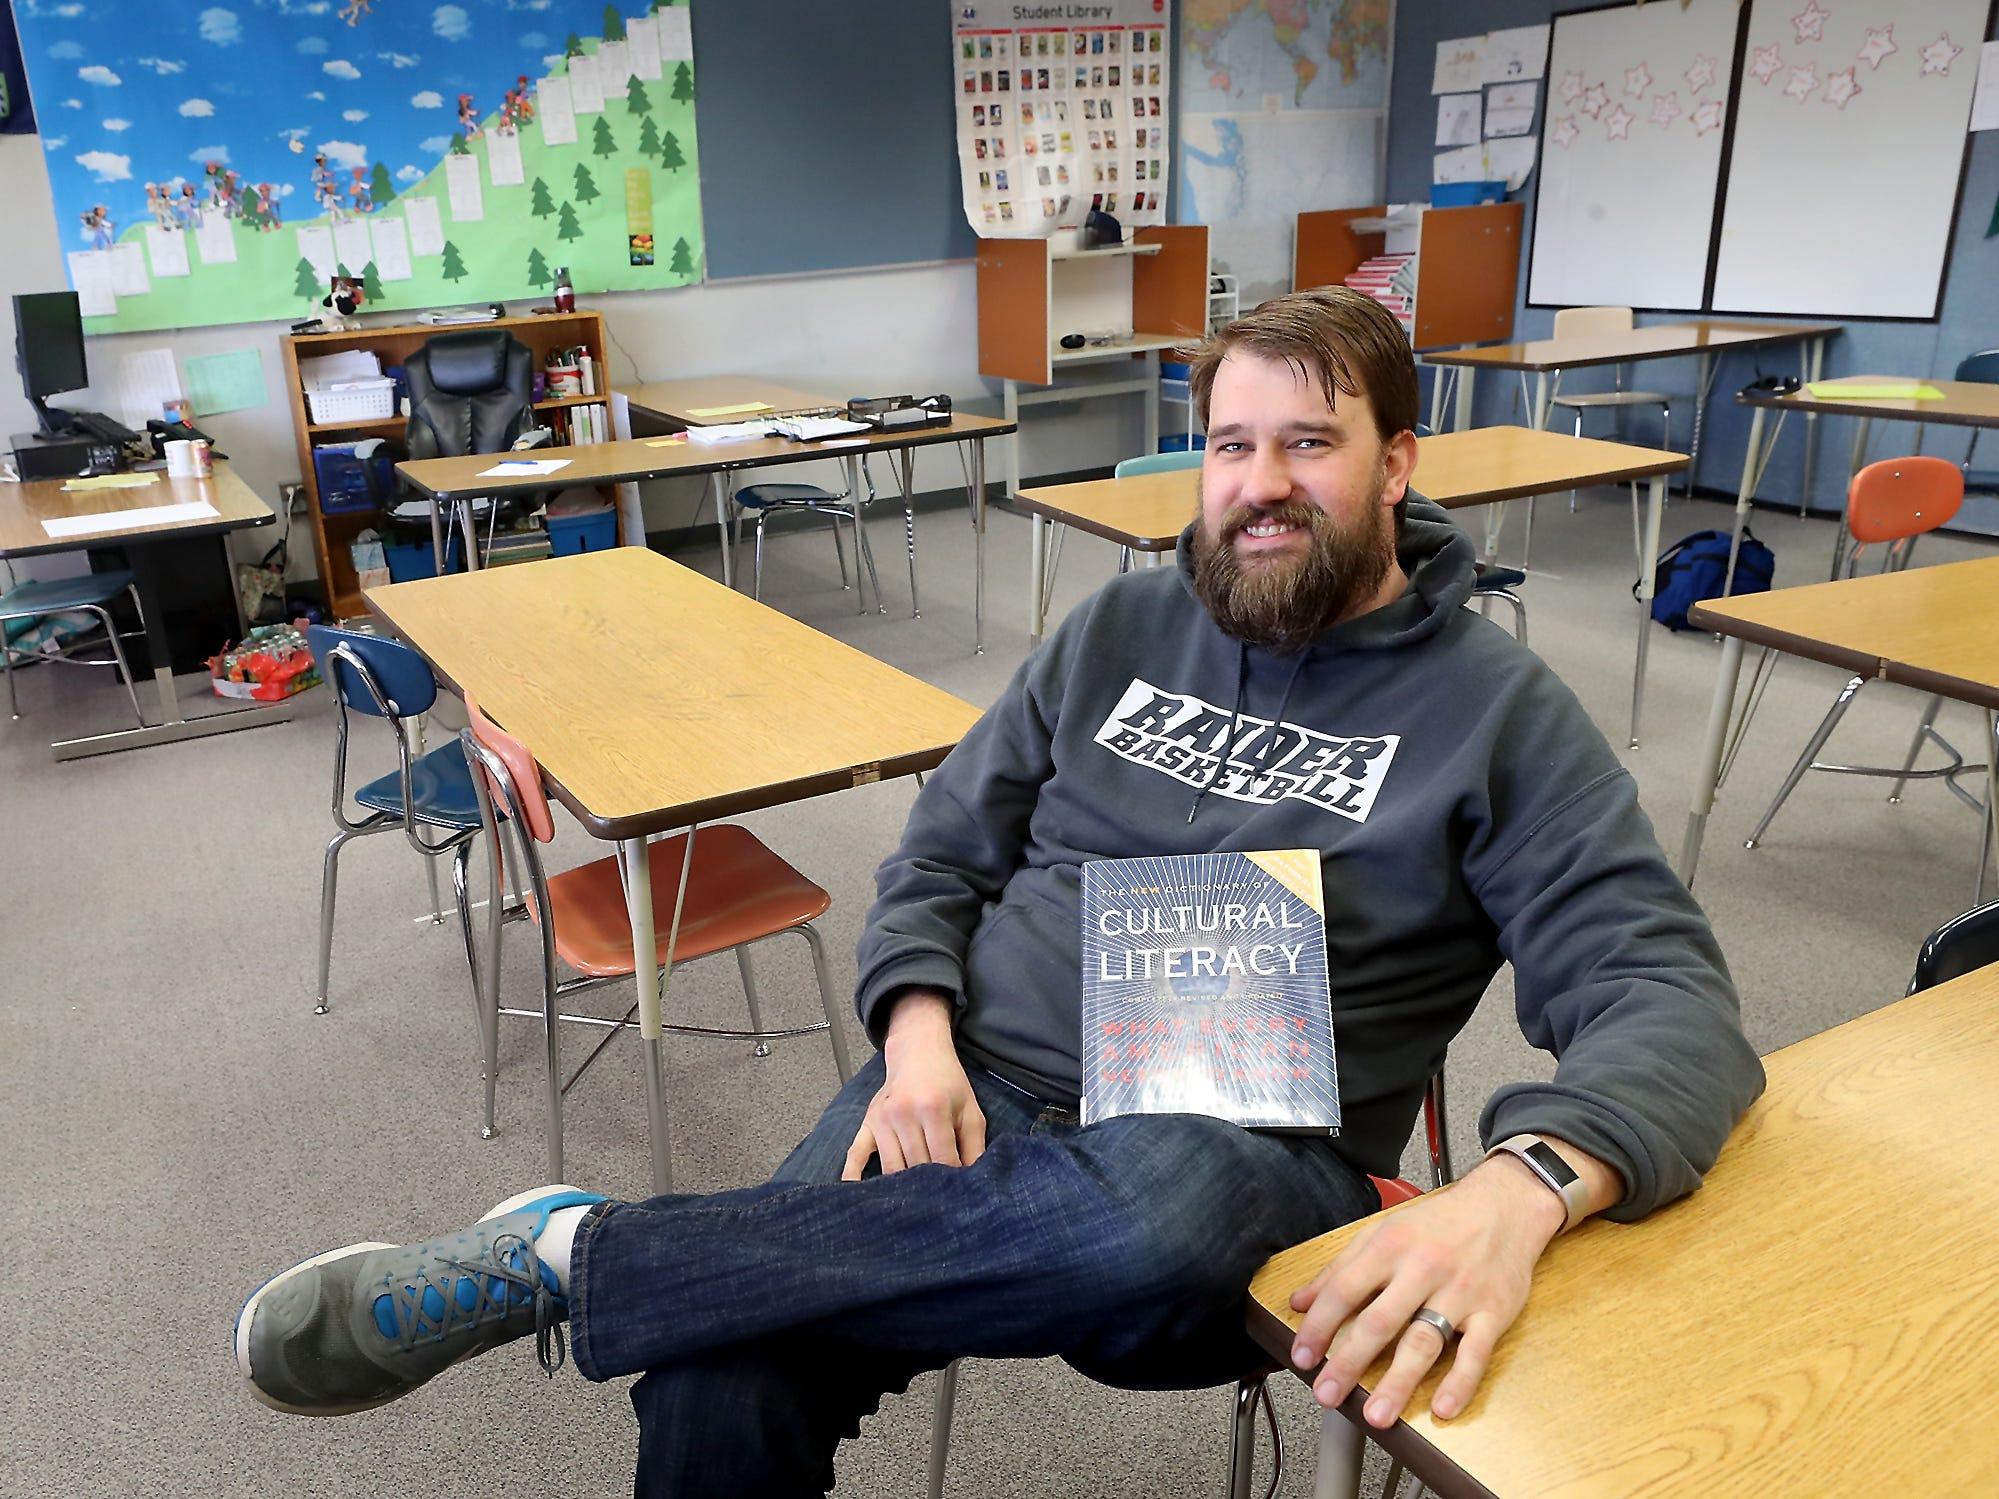 Ridgetop Middle School teacher Joe Rengstorf in his classroom on Tuesday, March 26, 2019.